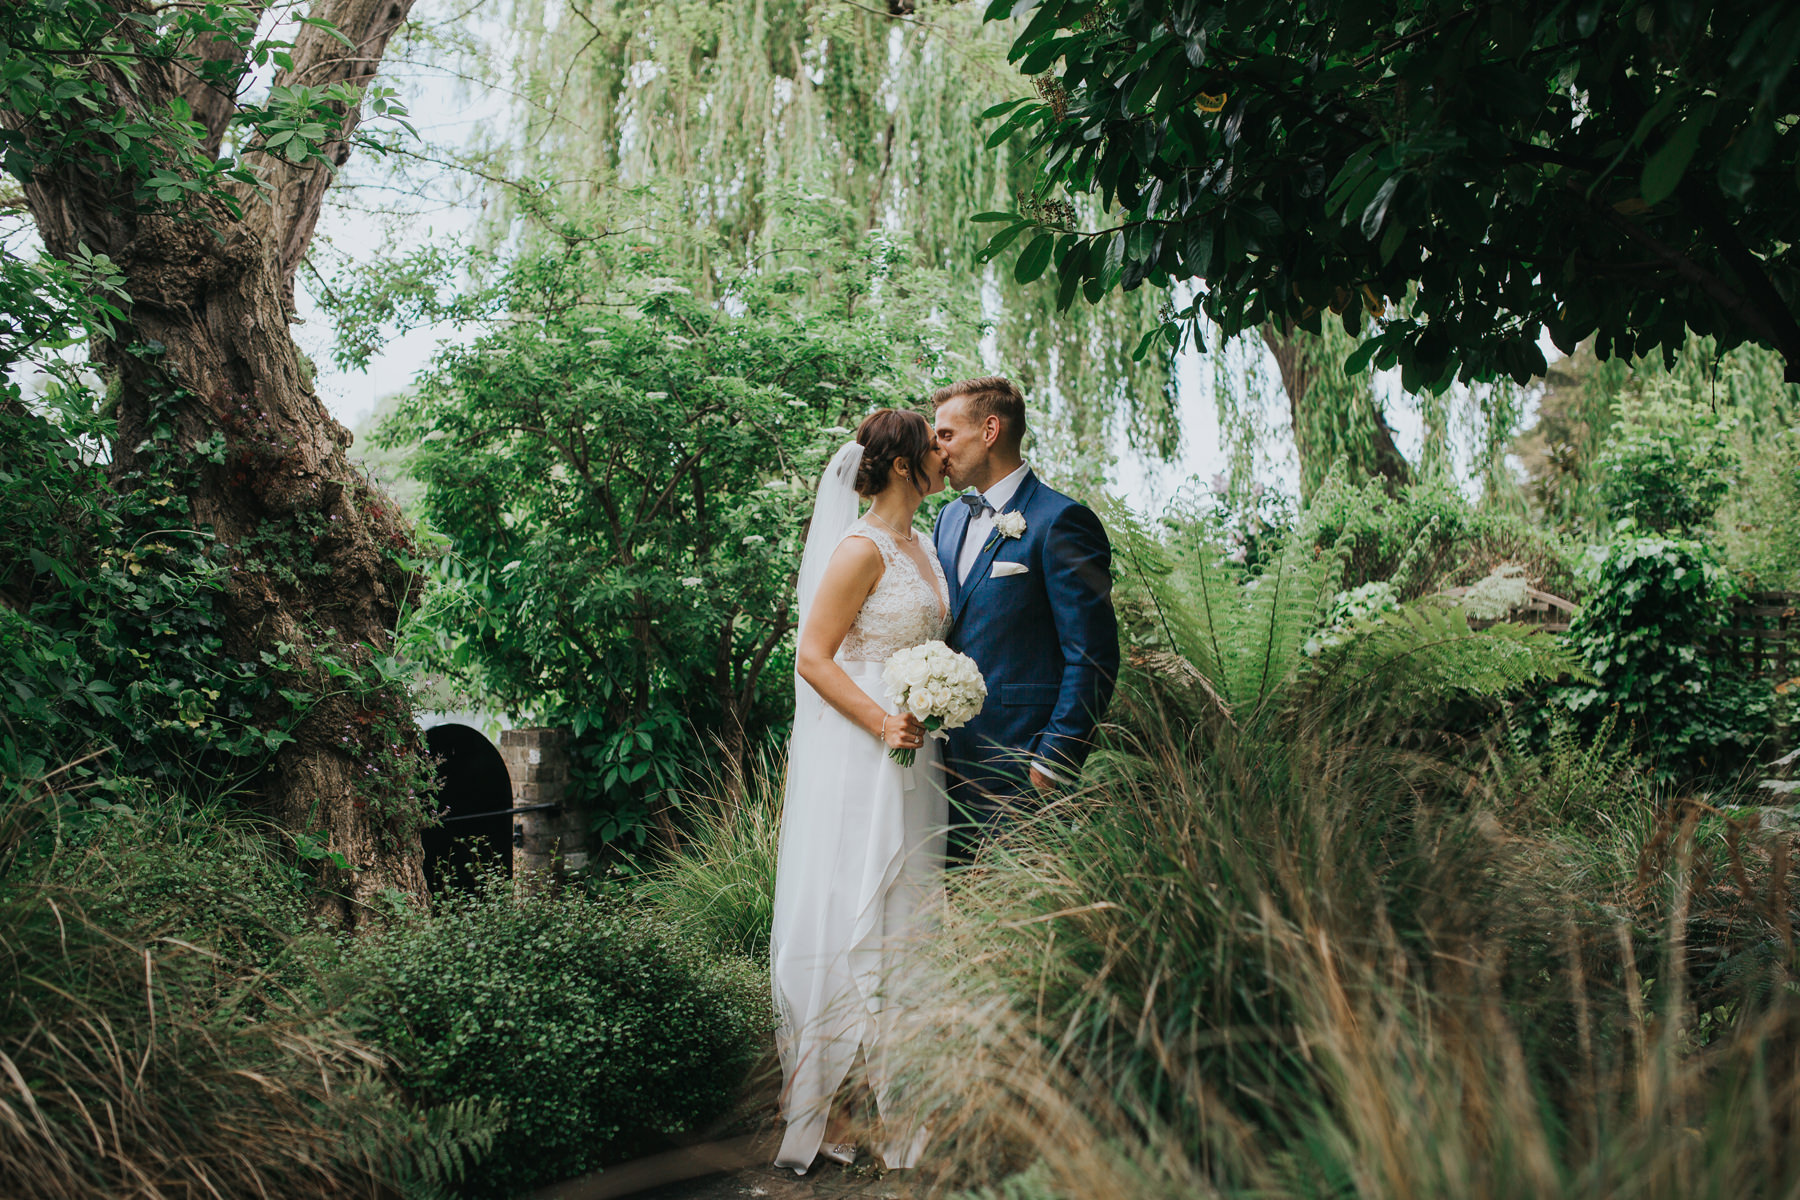 CRL-331-The Bingham wedding Richmond-Claire Rob bridal couple portraits.jpg